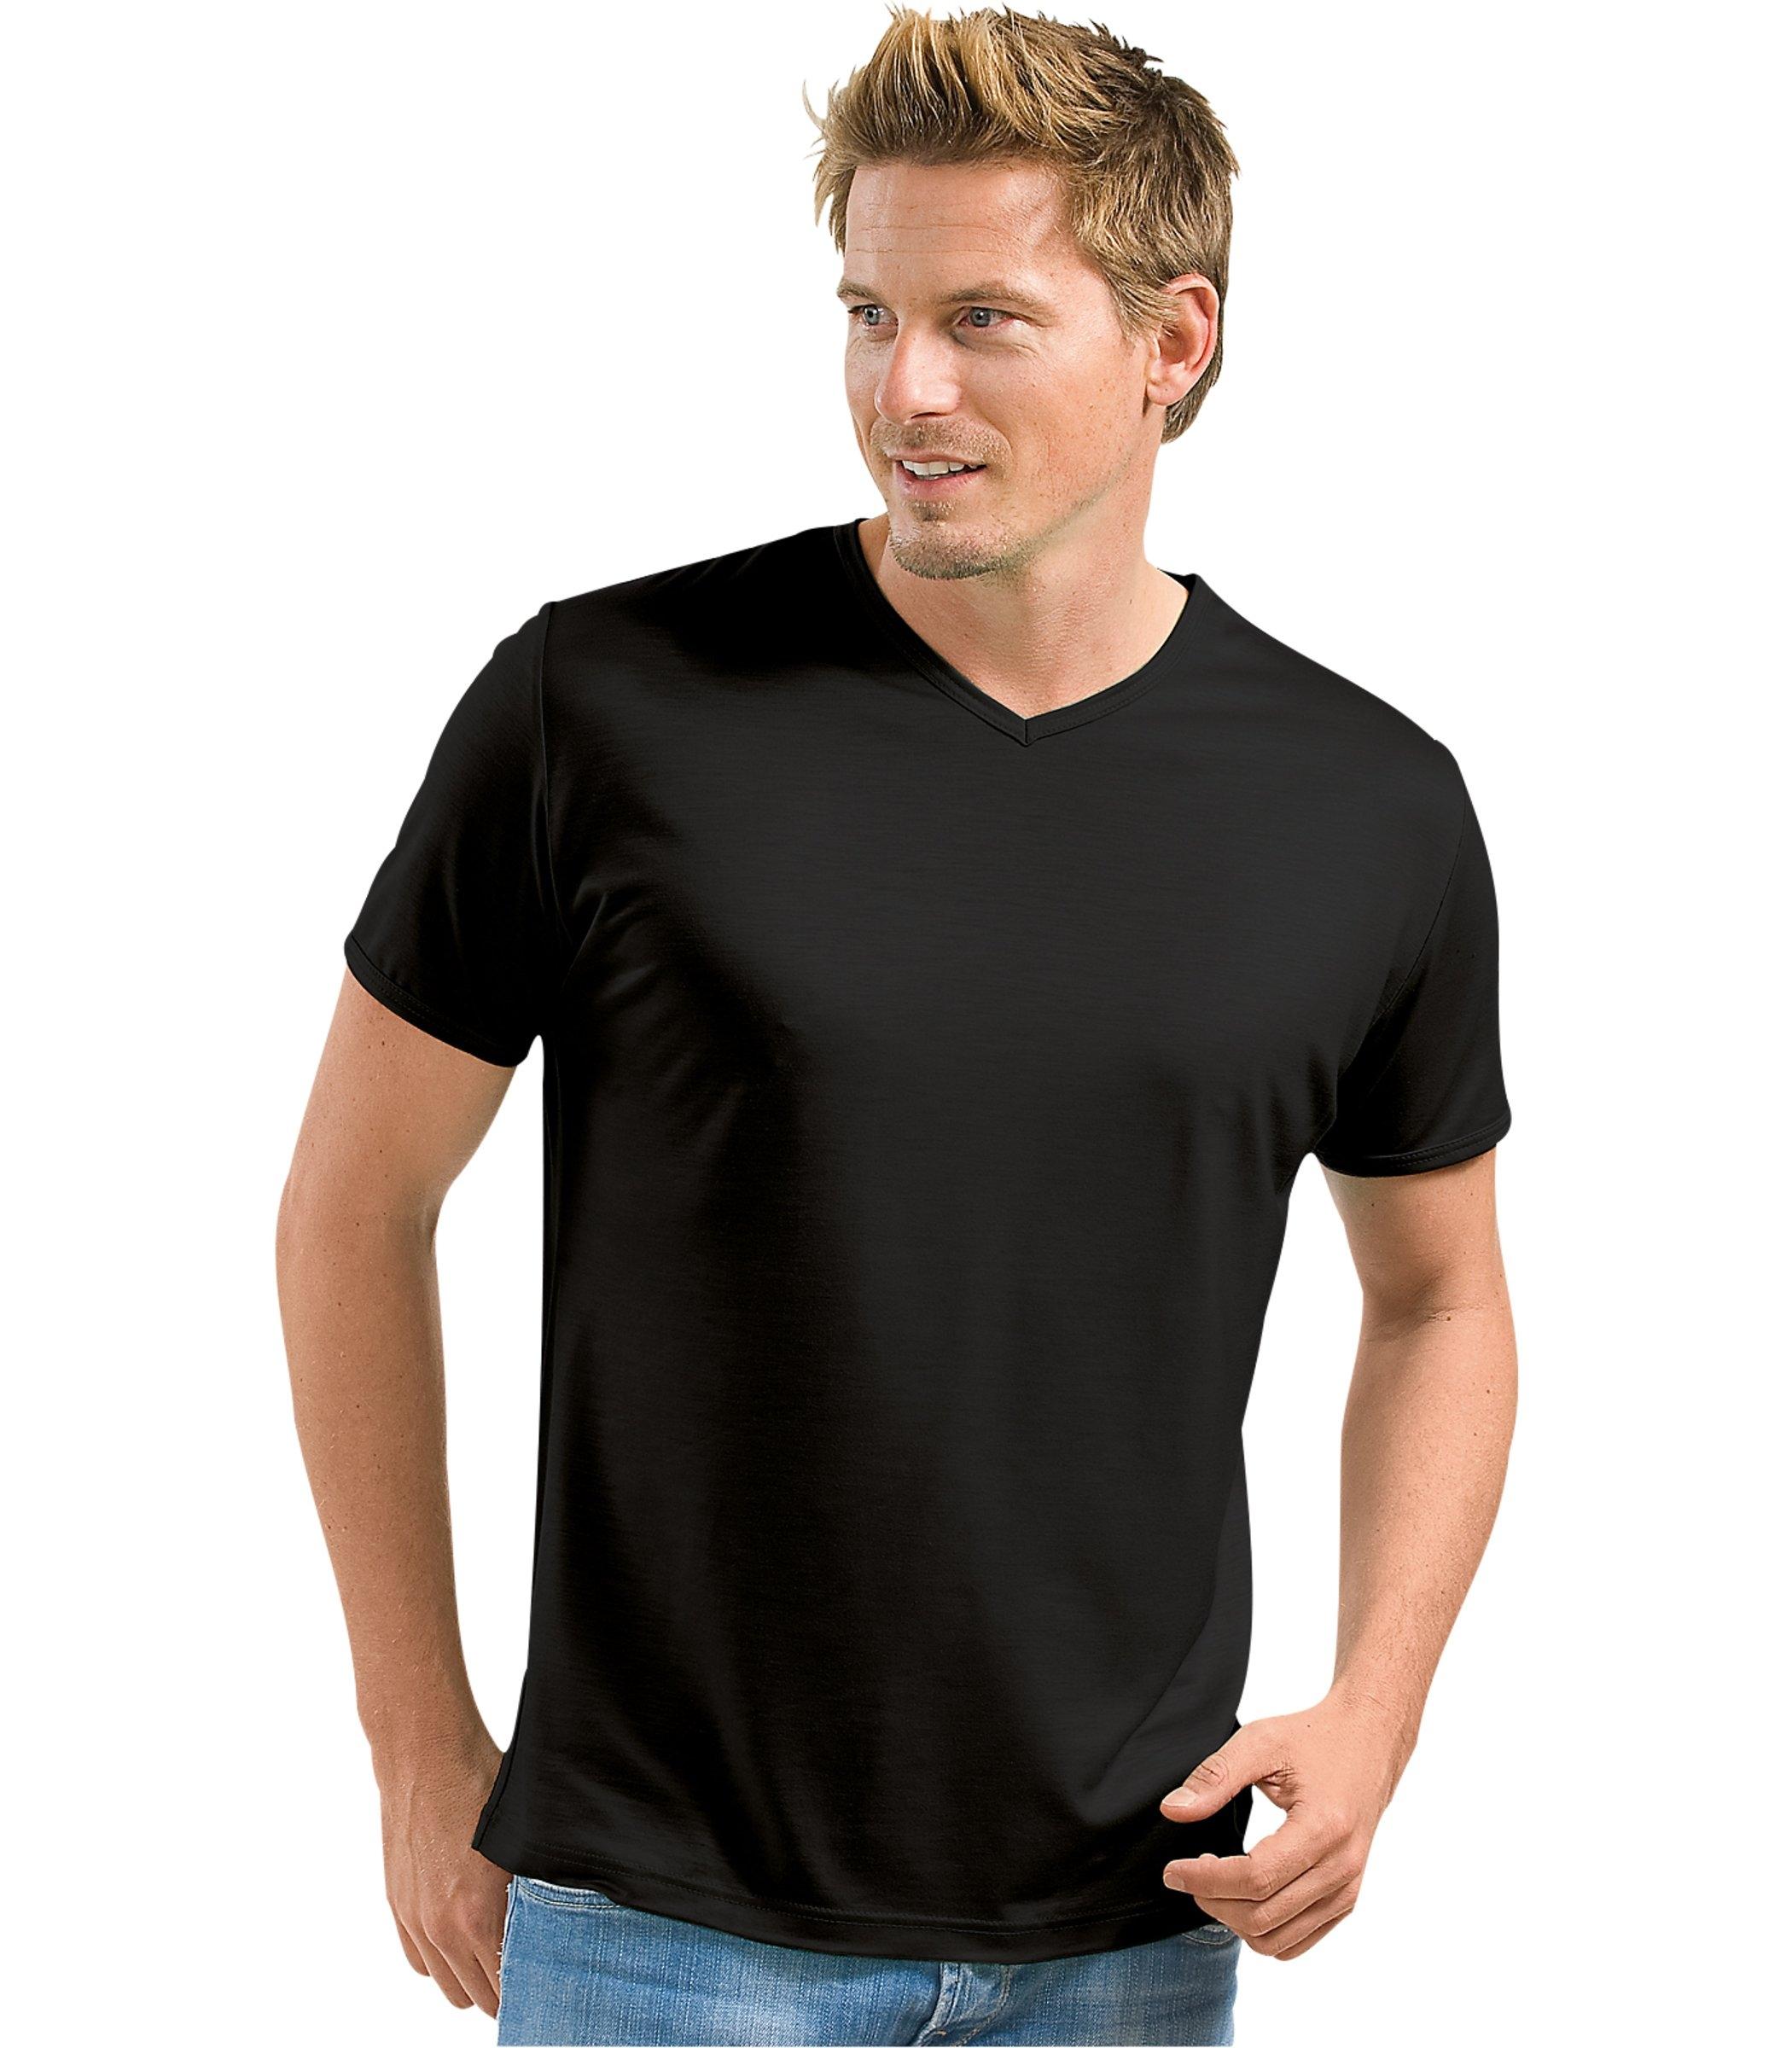 shirt Trigema T T Gevonden Trigema Snel Iybm7gf6vY